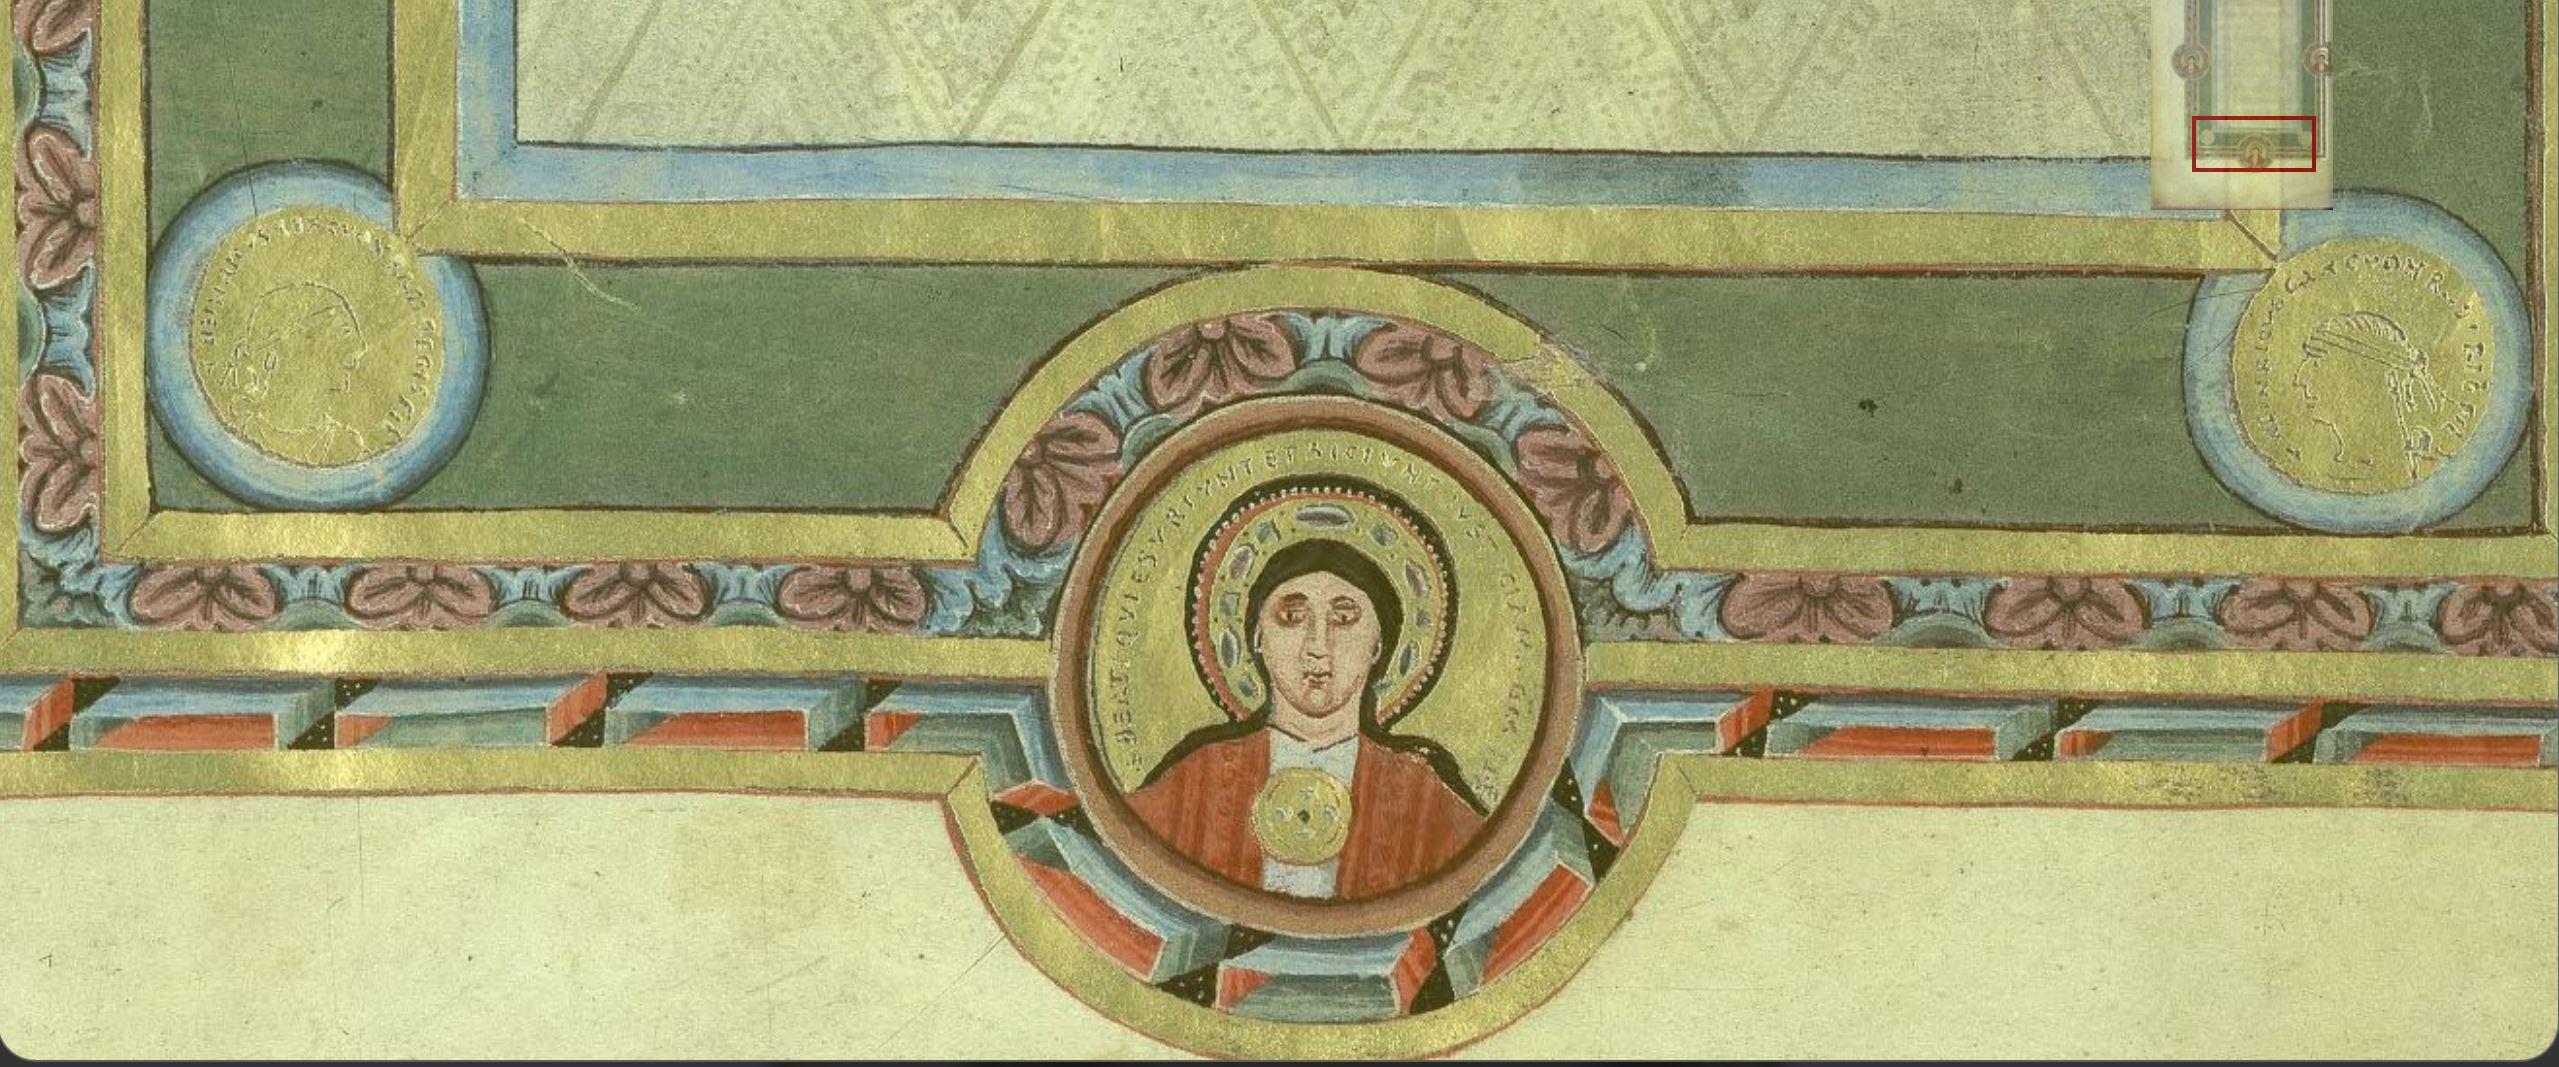 1046 Evangeliaire Henri III Beatitudes Codex Aureus Escurialensis fol 3 detail